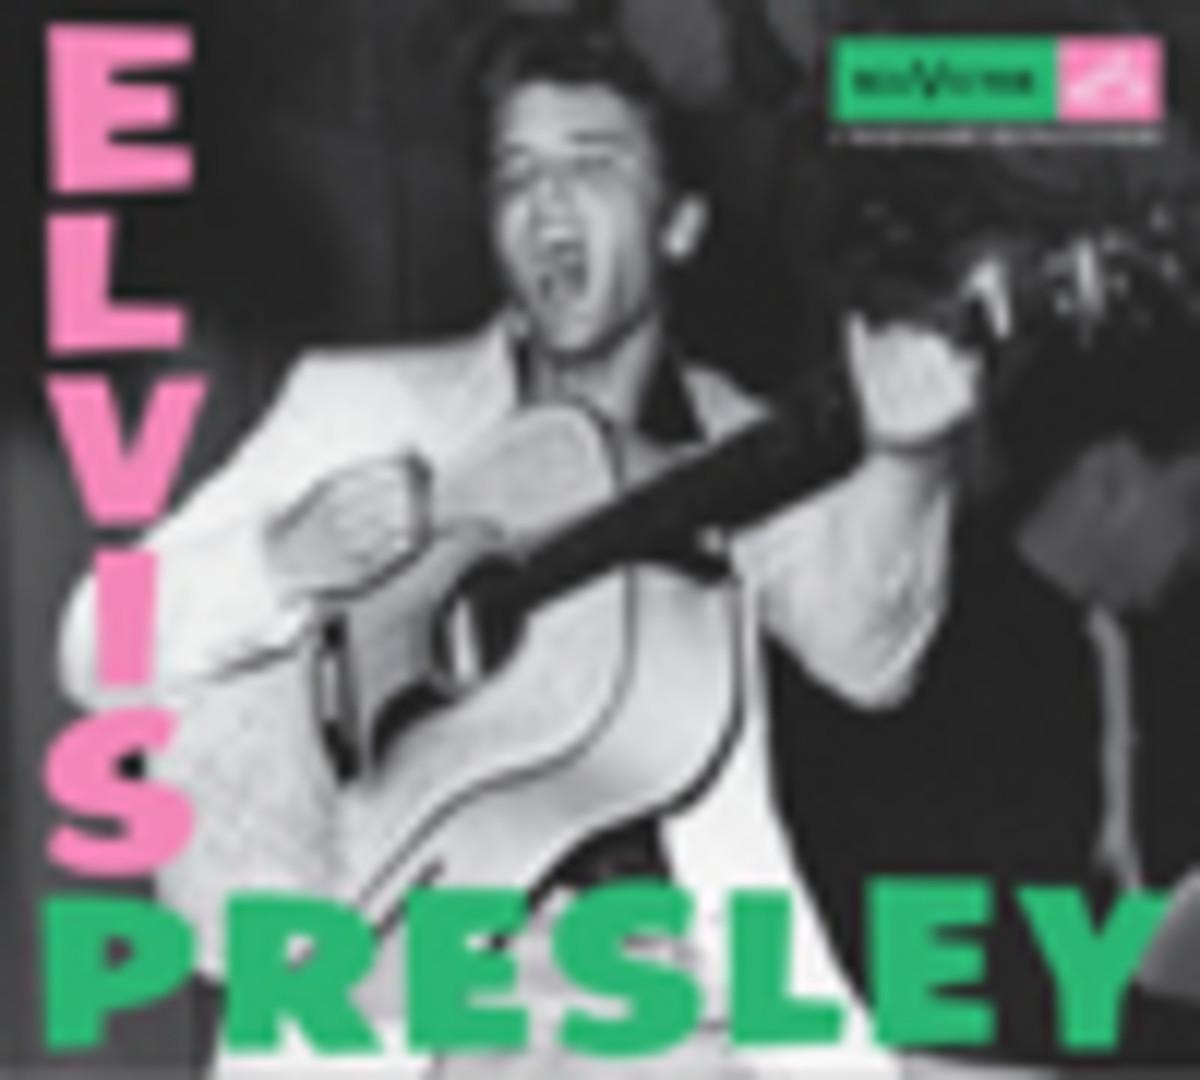 Elvis Presley debut album